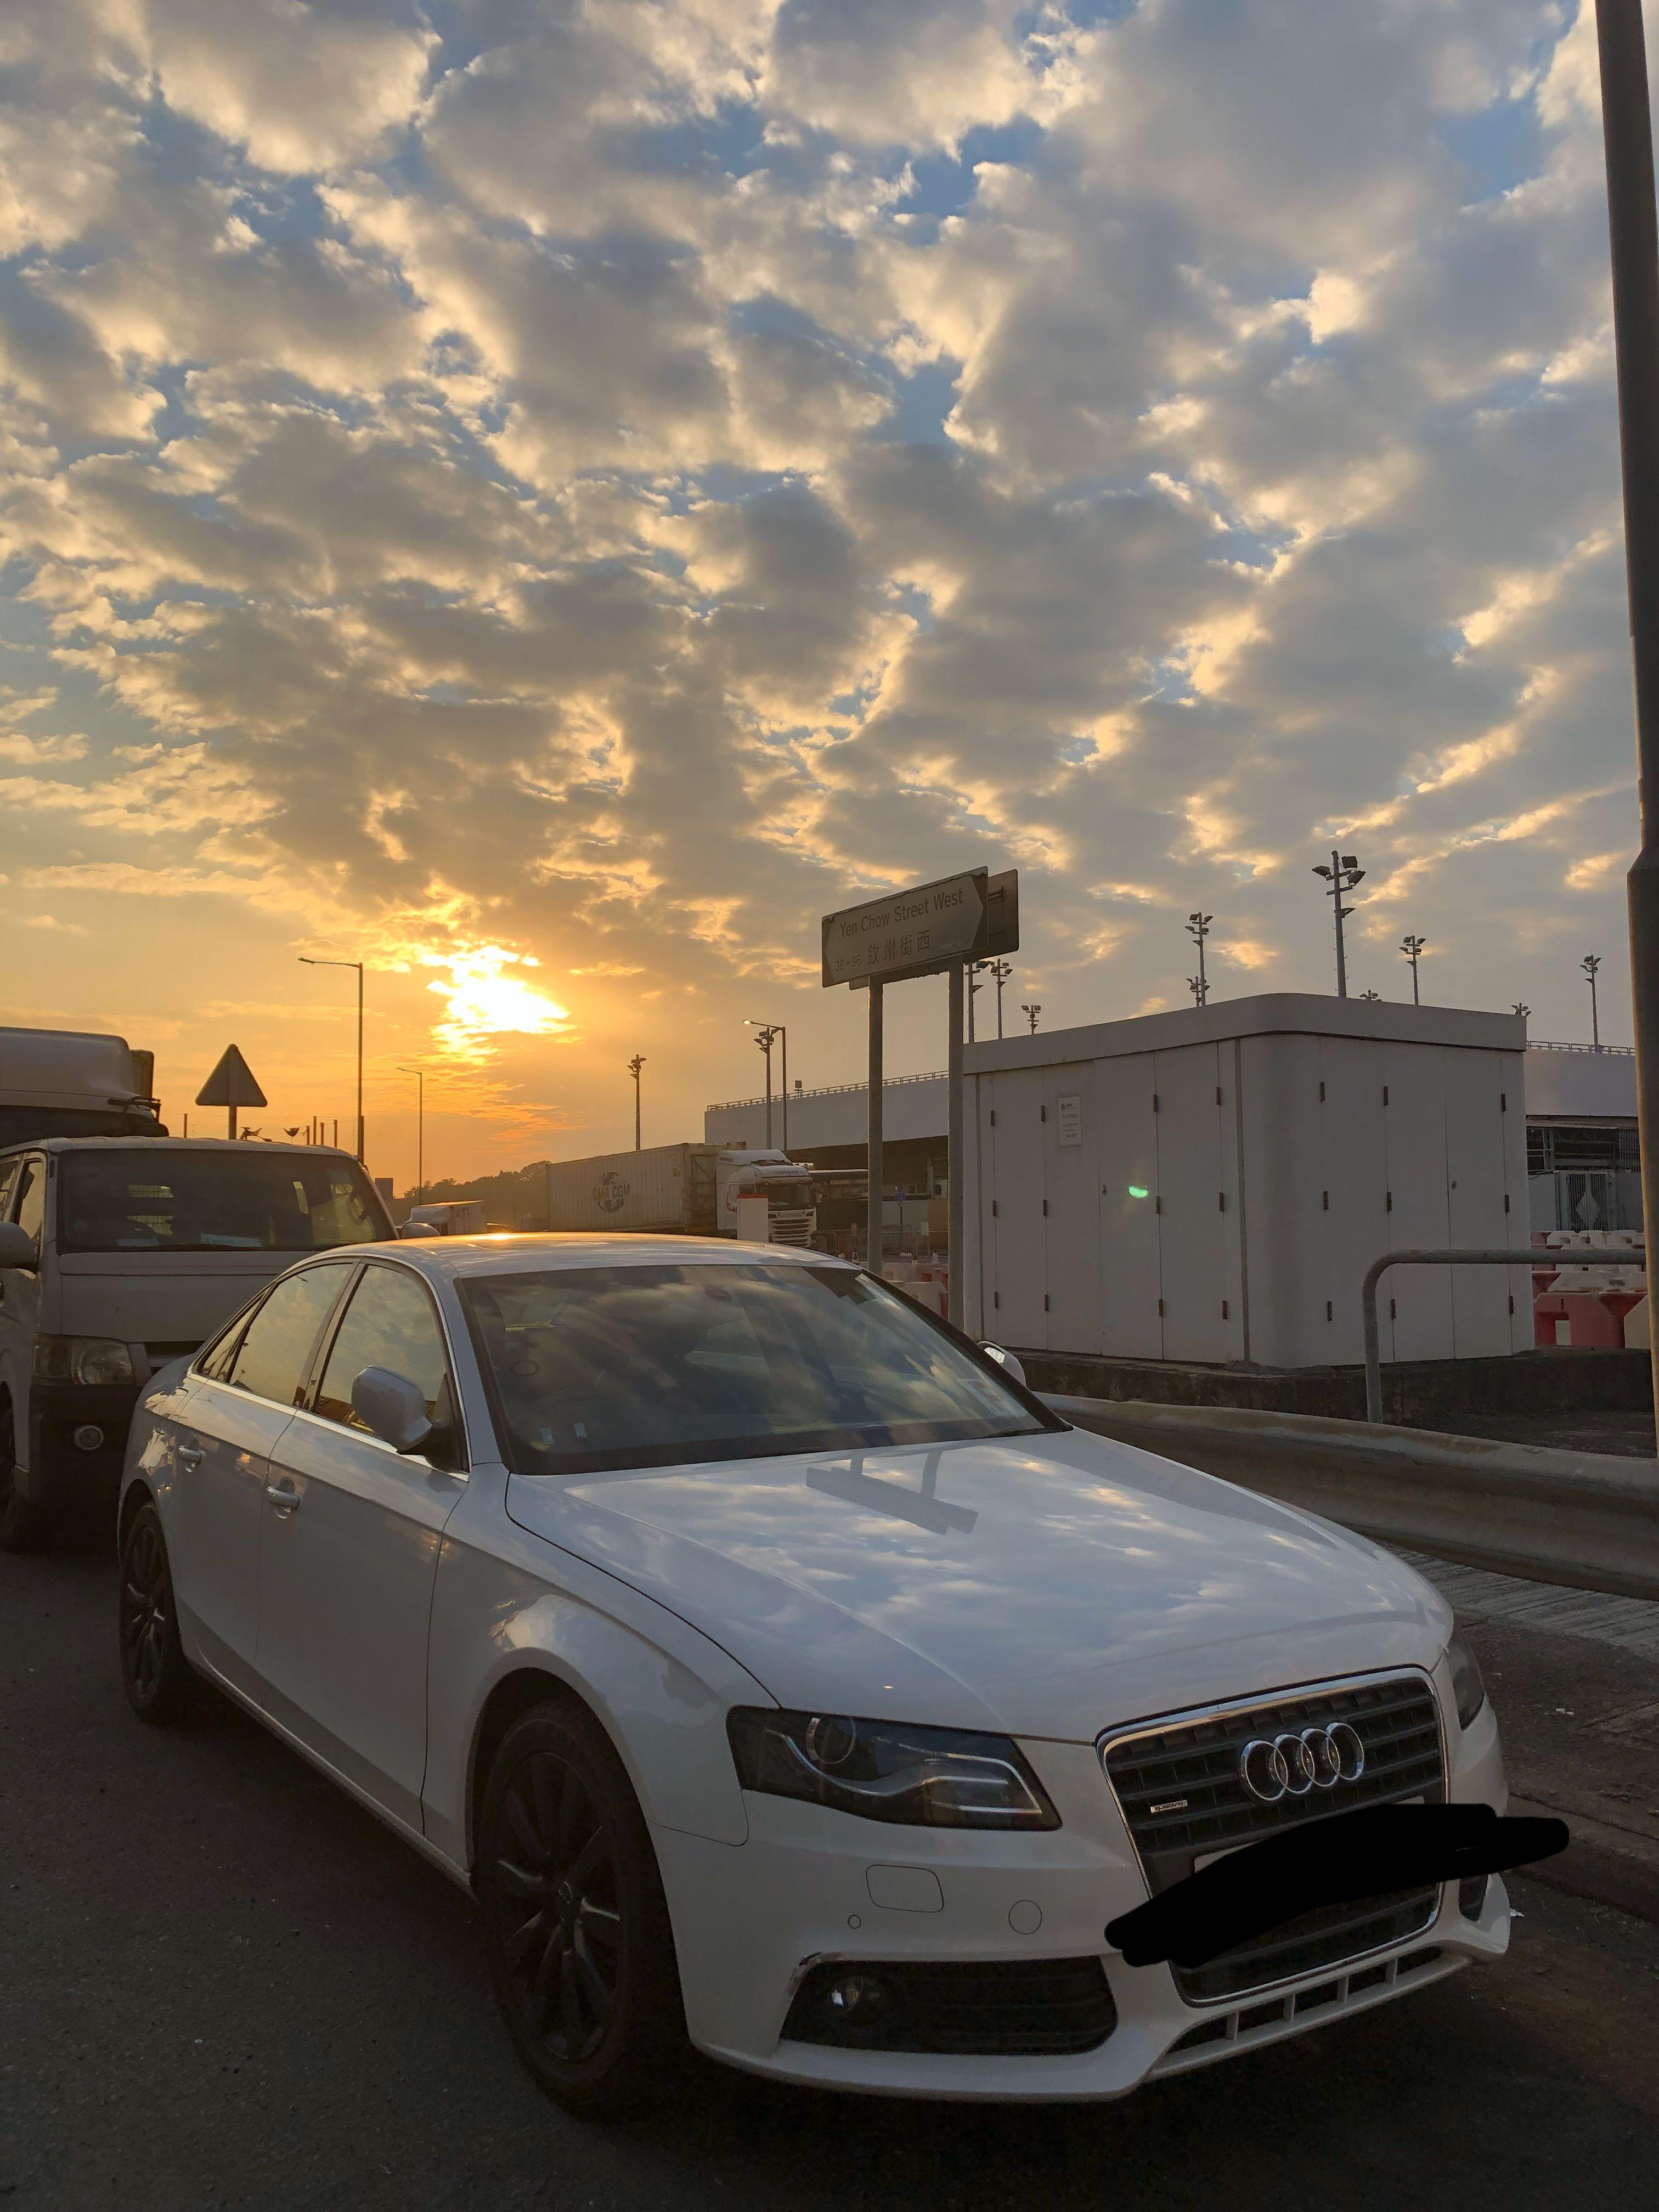 Audi A4 Sedan 2.0 TFSI quattro S tronic Ambition Auto